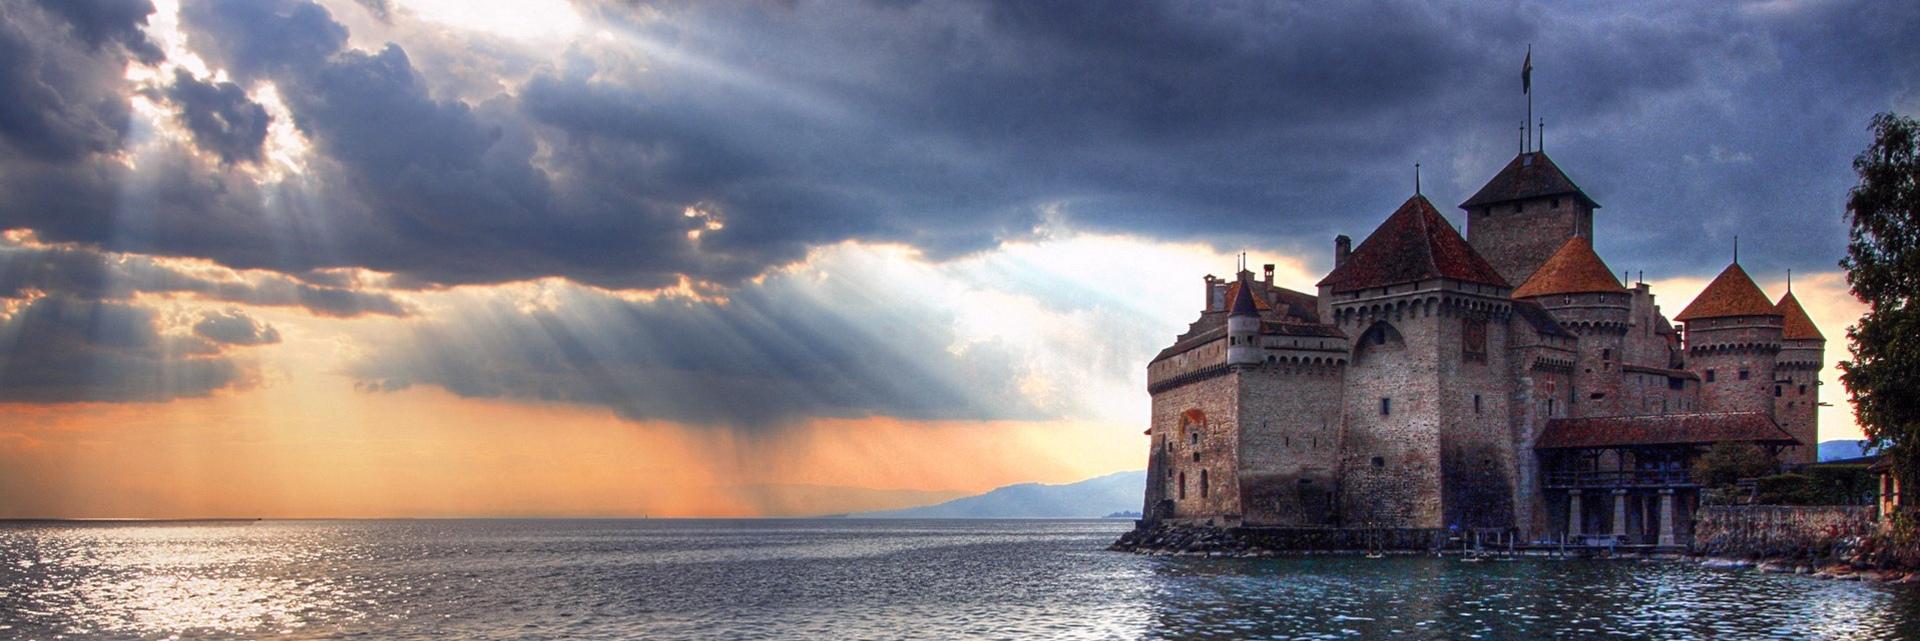 Chateau-de-Chillon-Switzerland